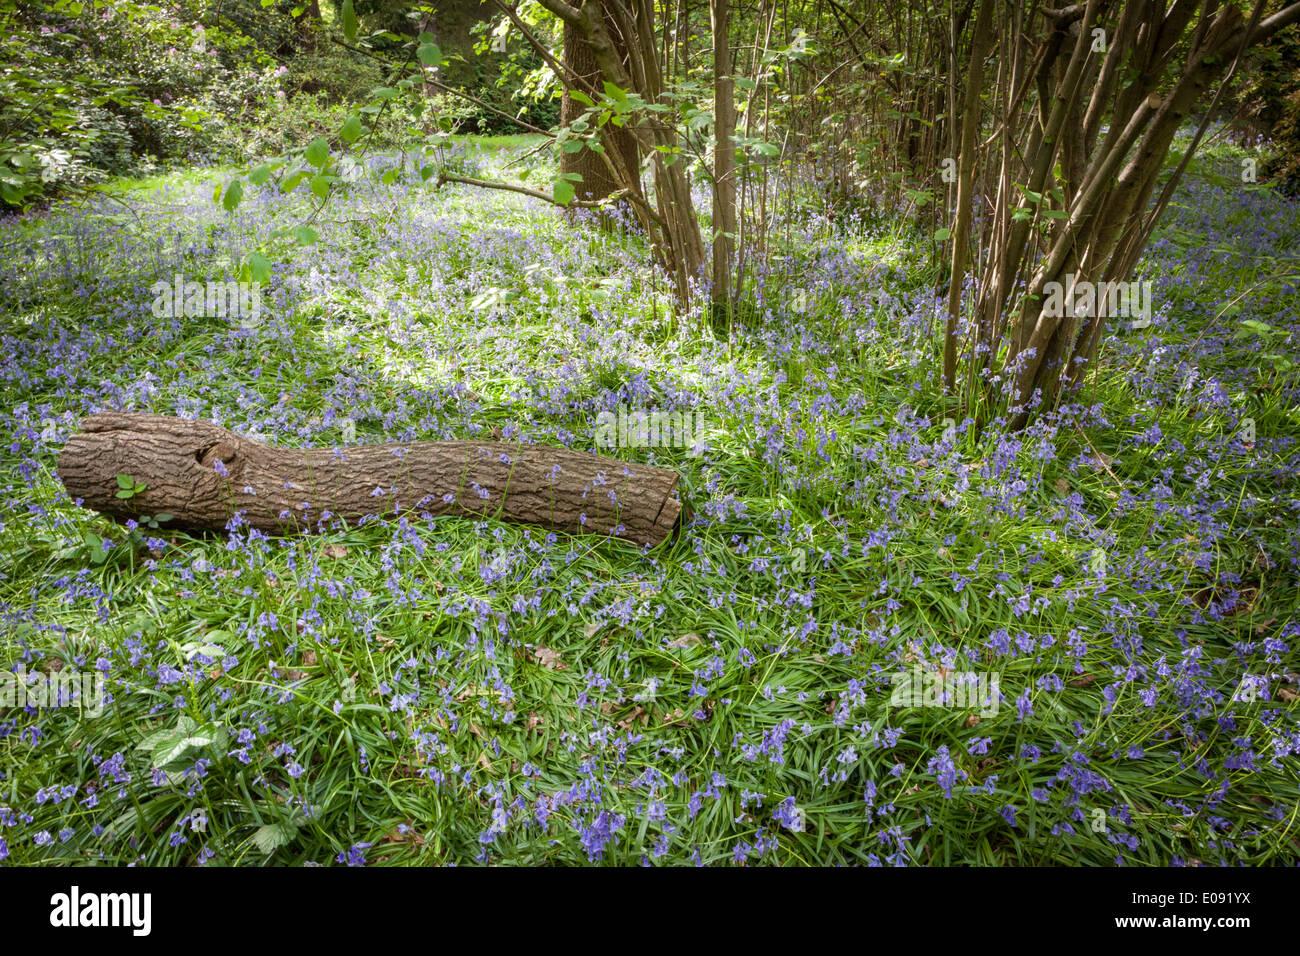 Bluebells in the isabella plantation richmond park